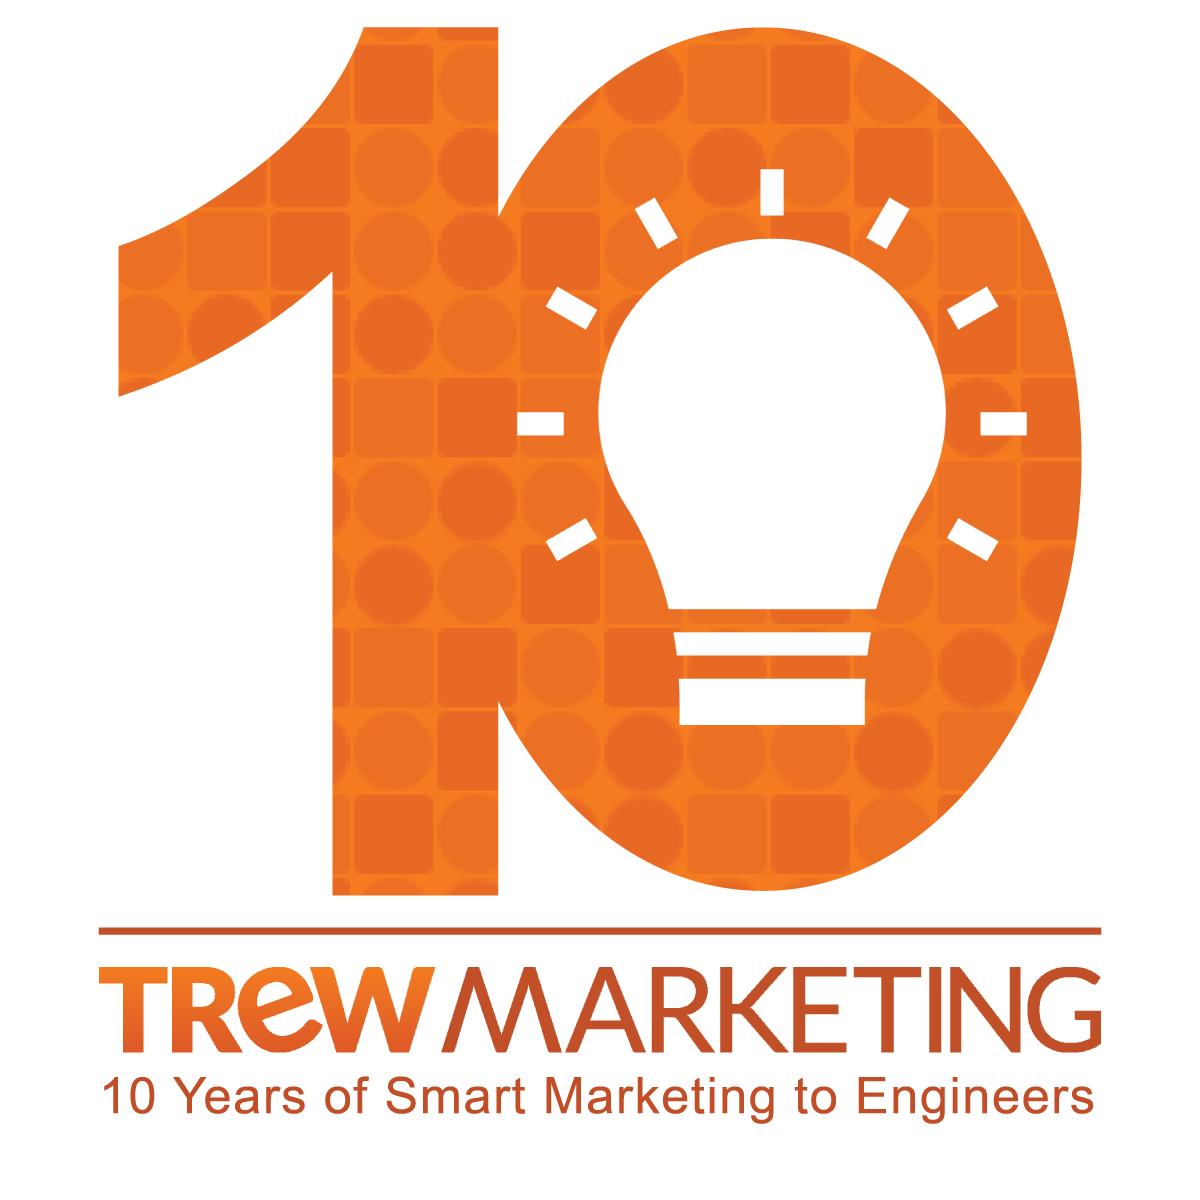 Trew marketing trewmarketing replies. Twitter like png